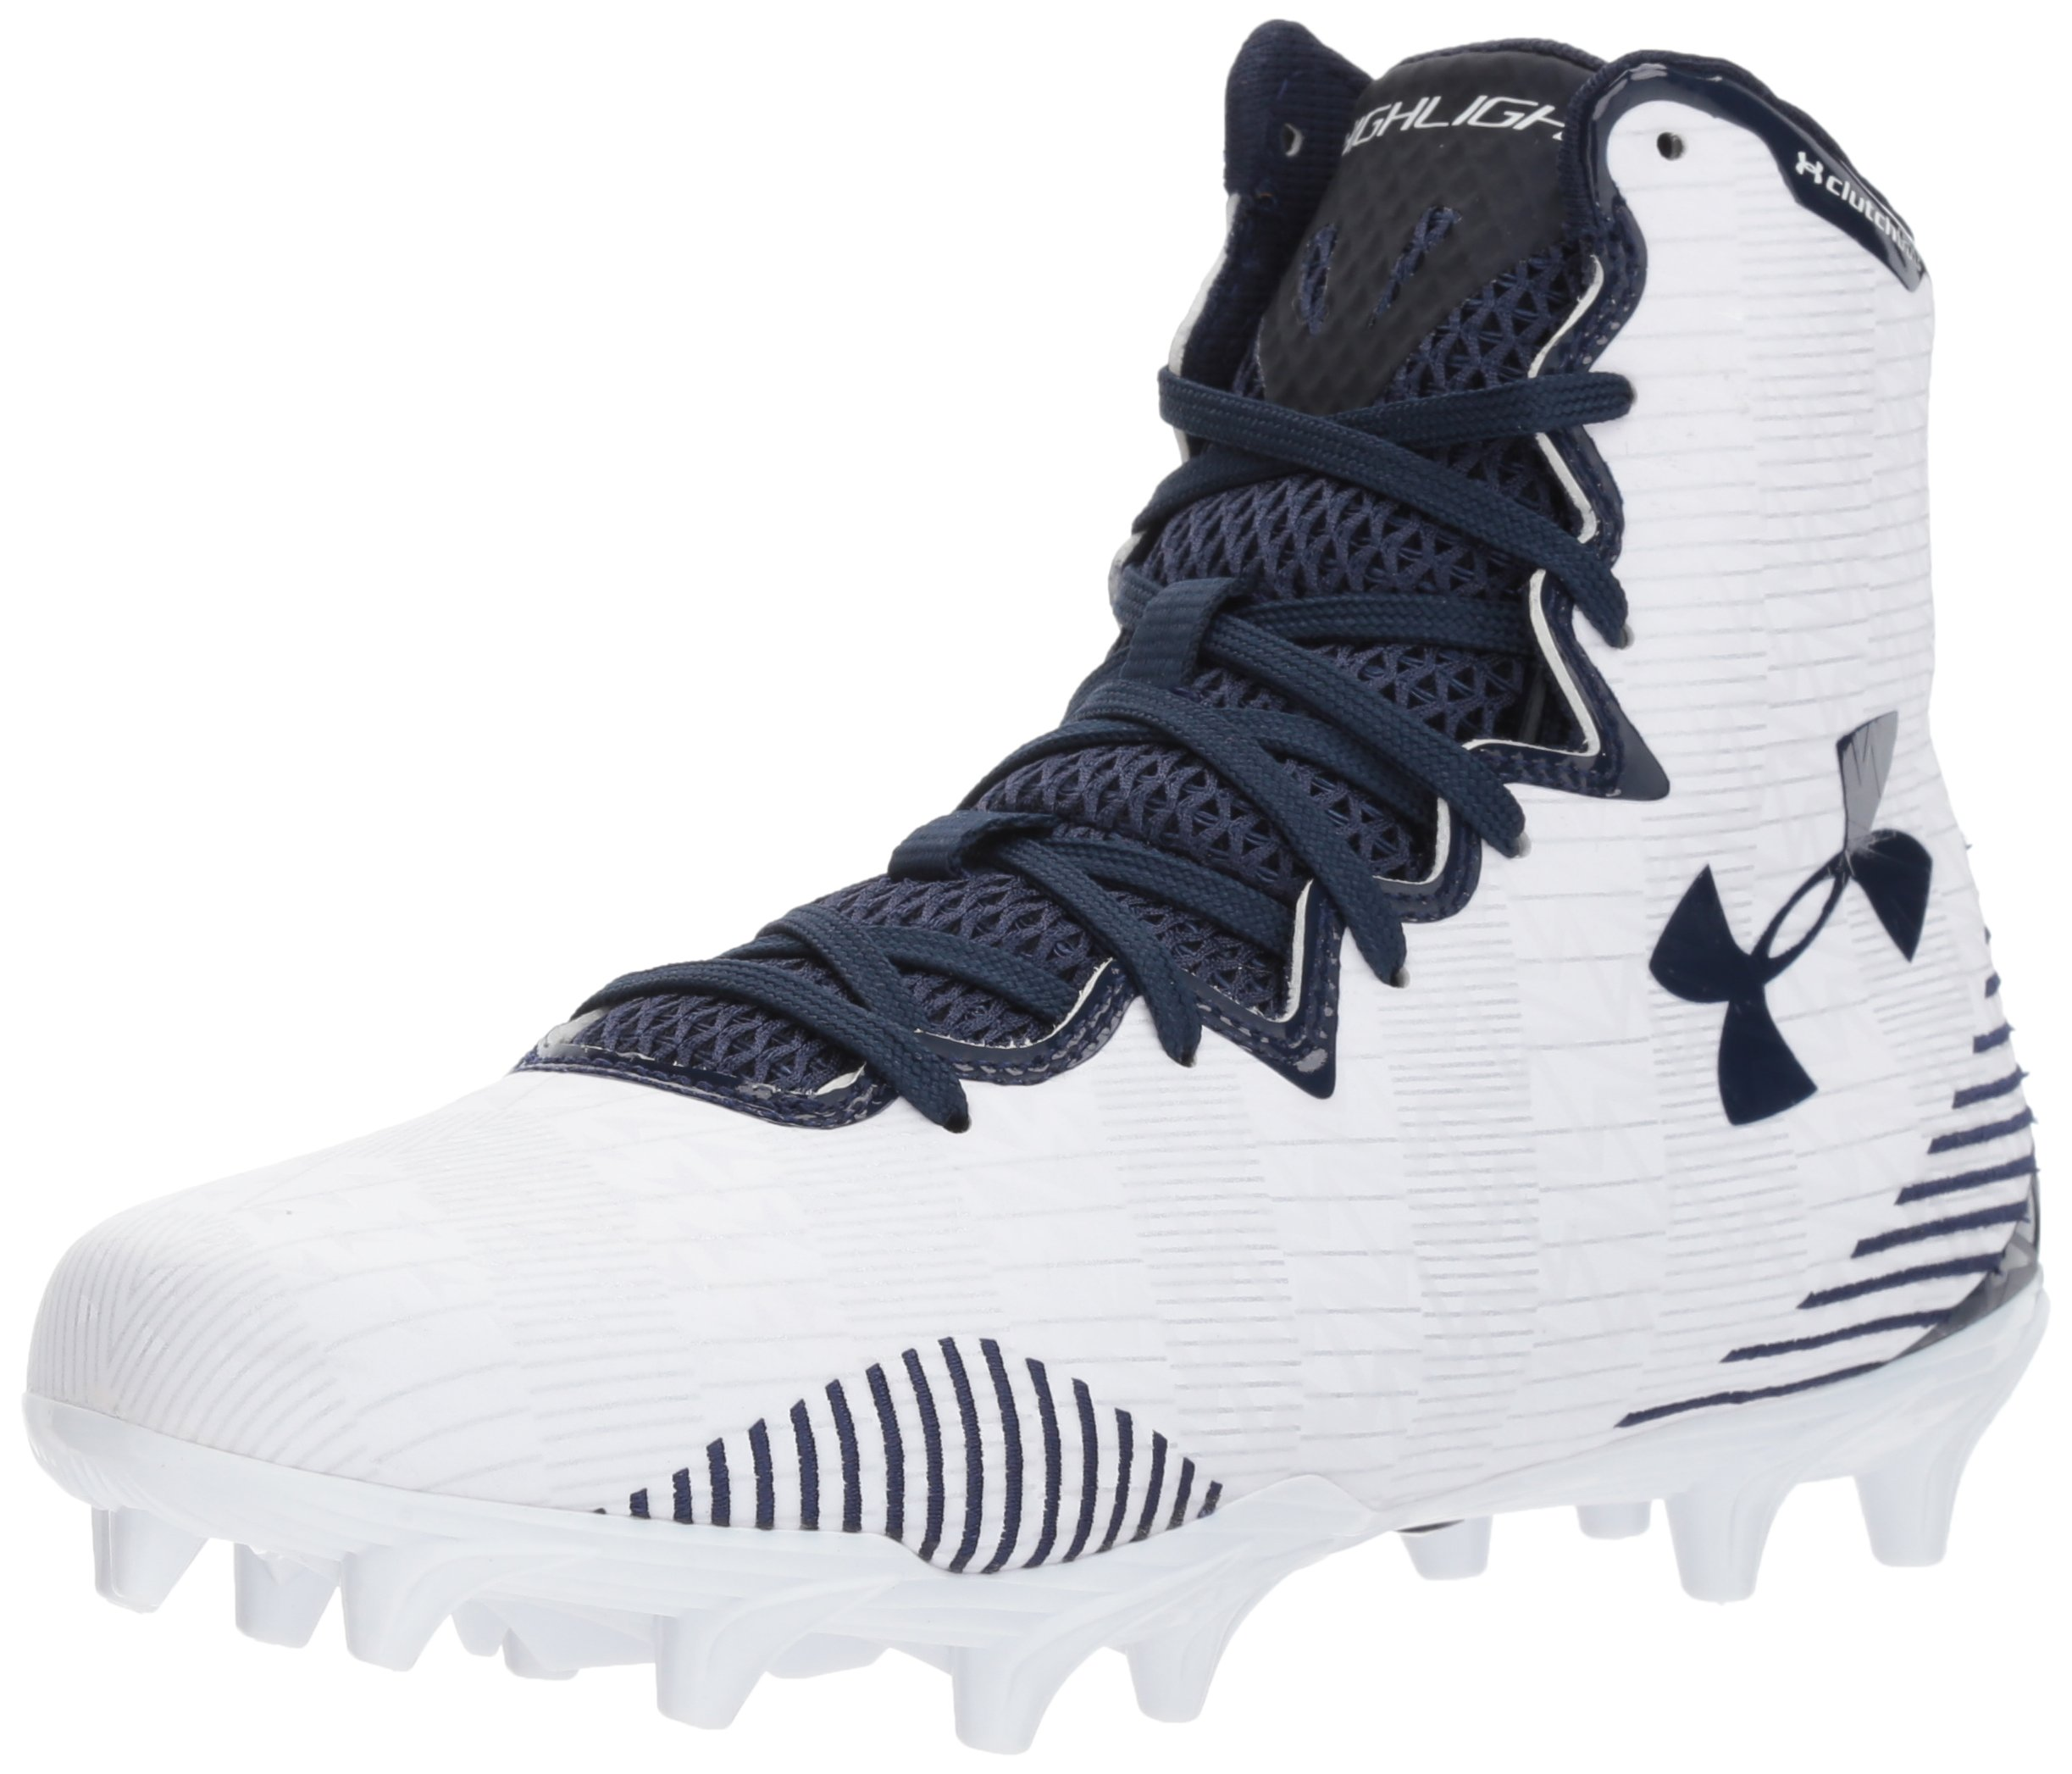 Under Armour Women's Lax Highlight MC Lacrosse Shoe, White (101)/Midnight Navy, 5.5